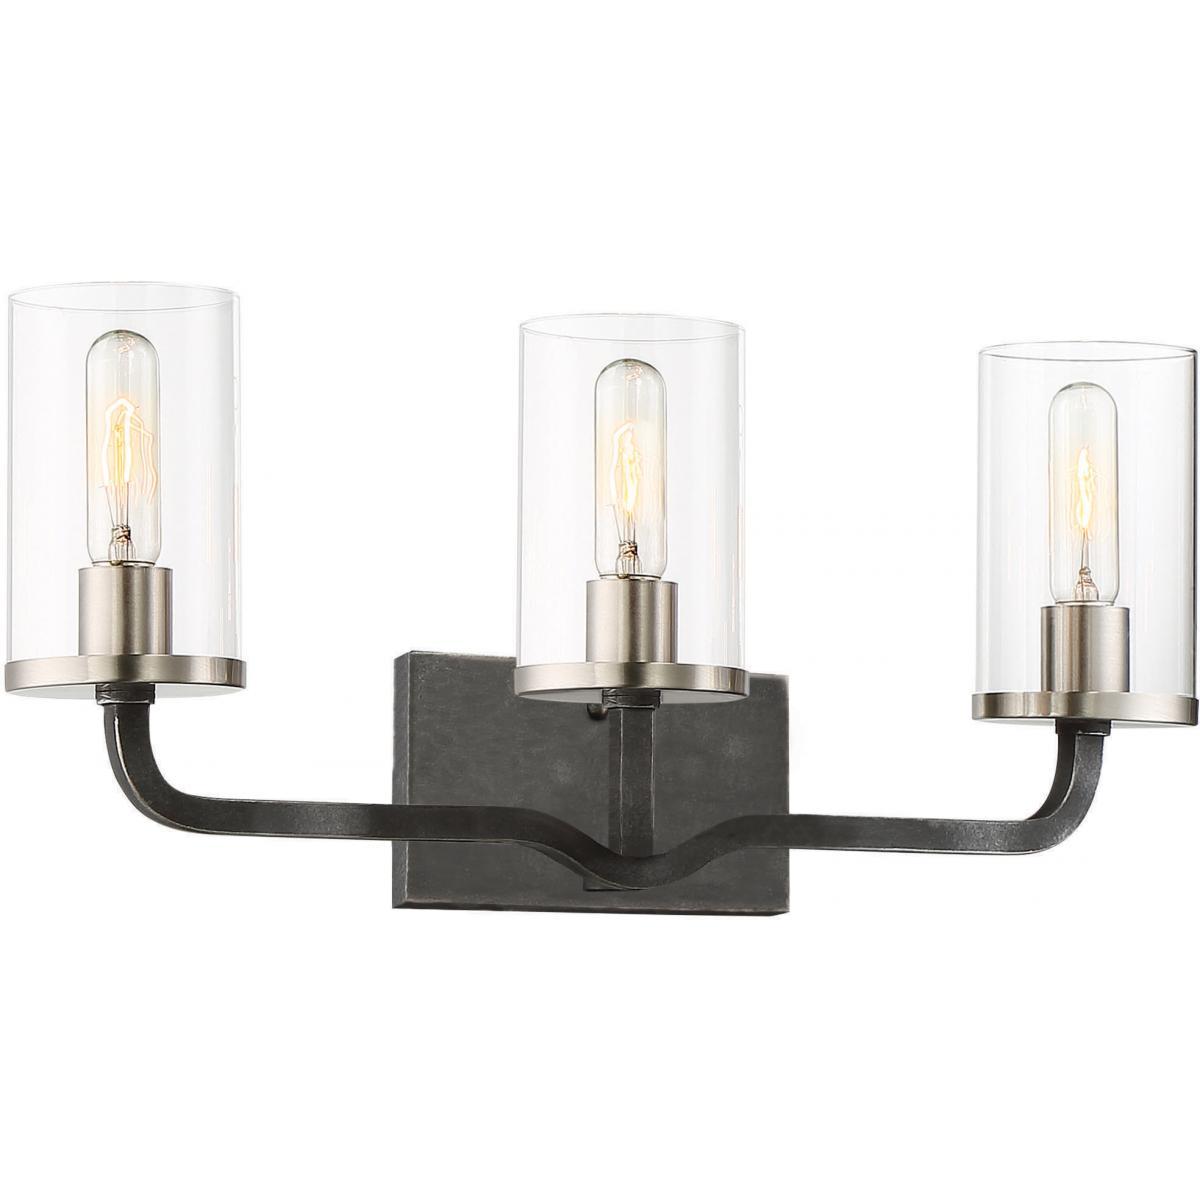 60-6123 SHERWOOD 3 LIGHT VANITY